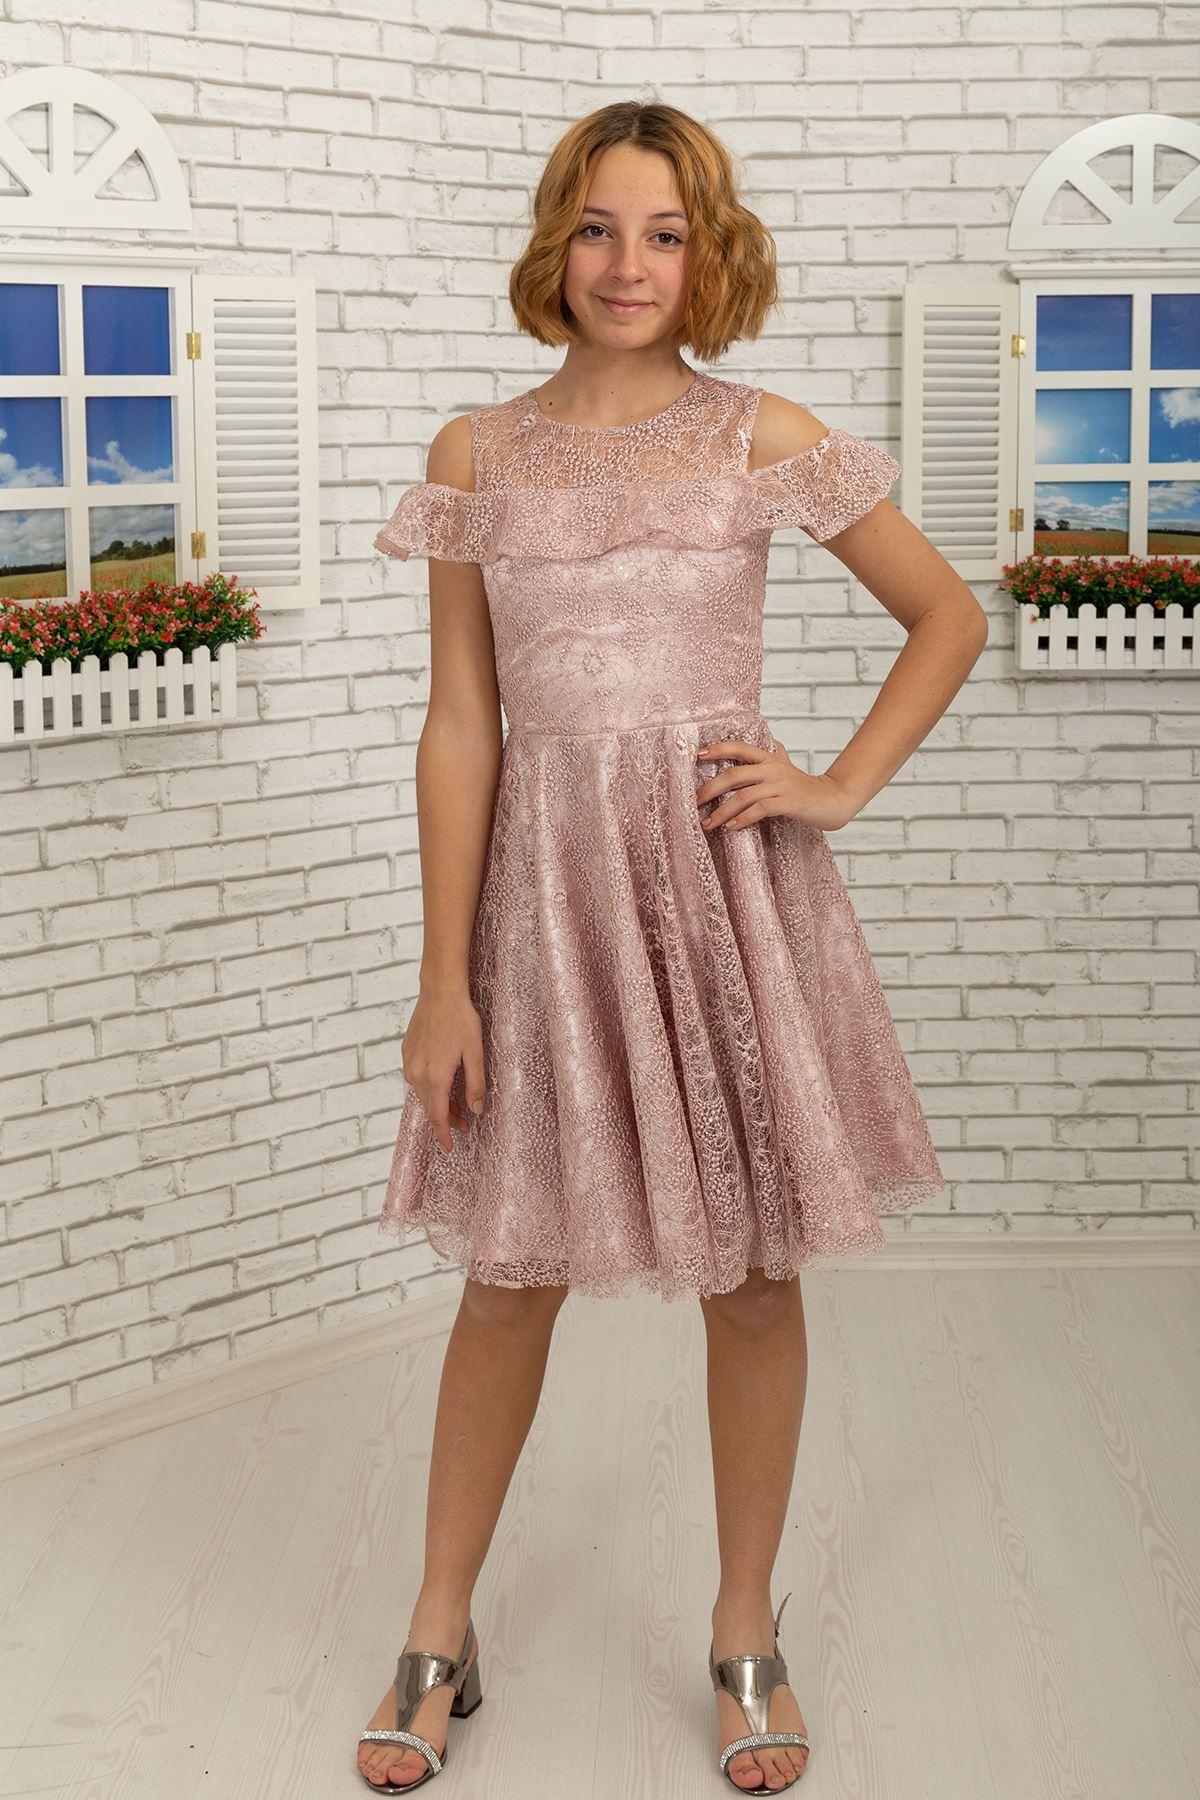 Shoulder detail, lace short Skirt Girl Evening Dress 495 Powder